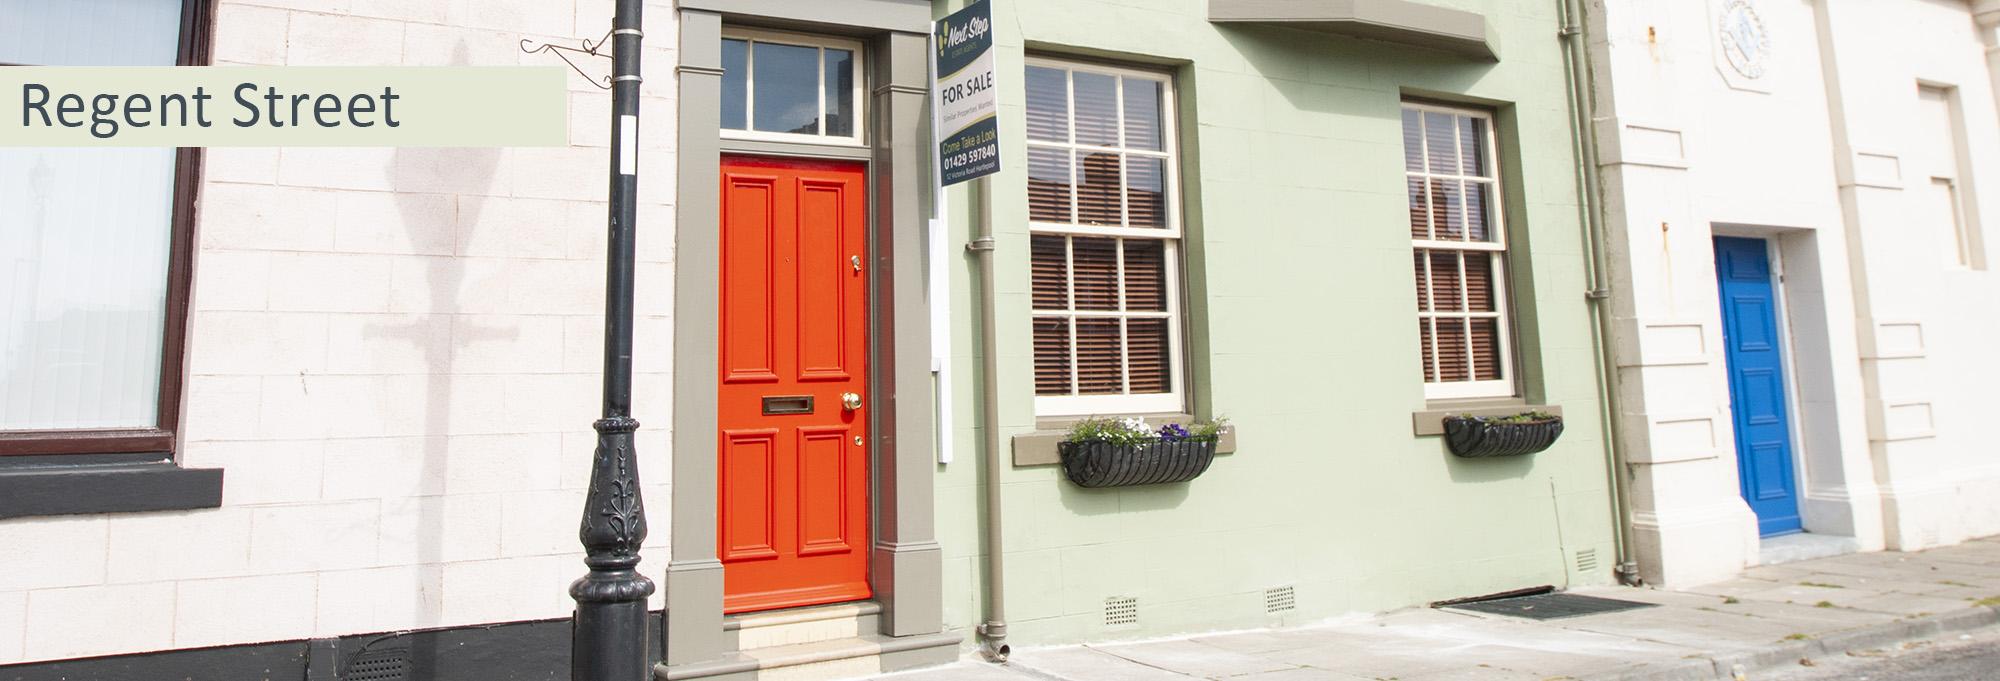 Regent Street The Headland OIRO £155,000